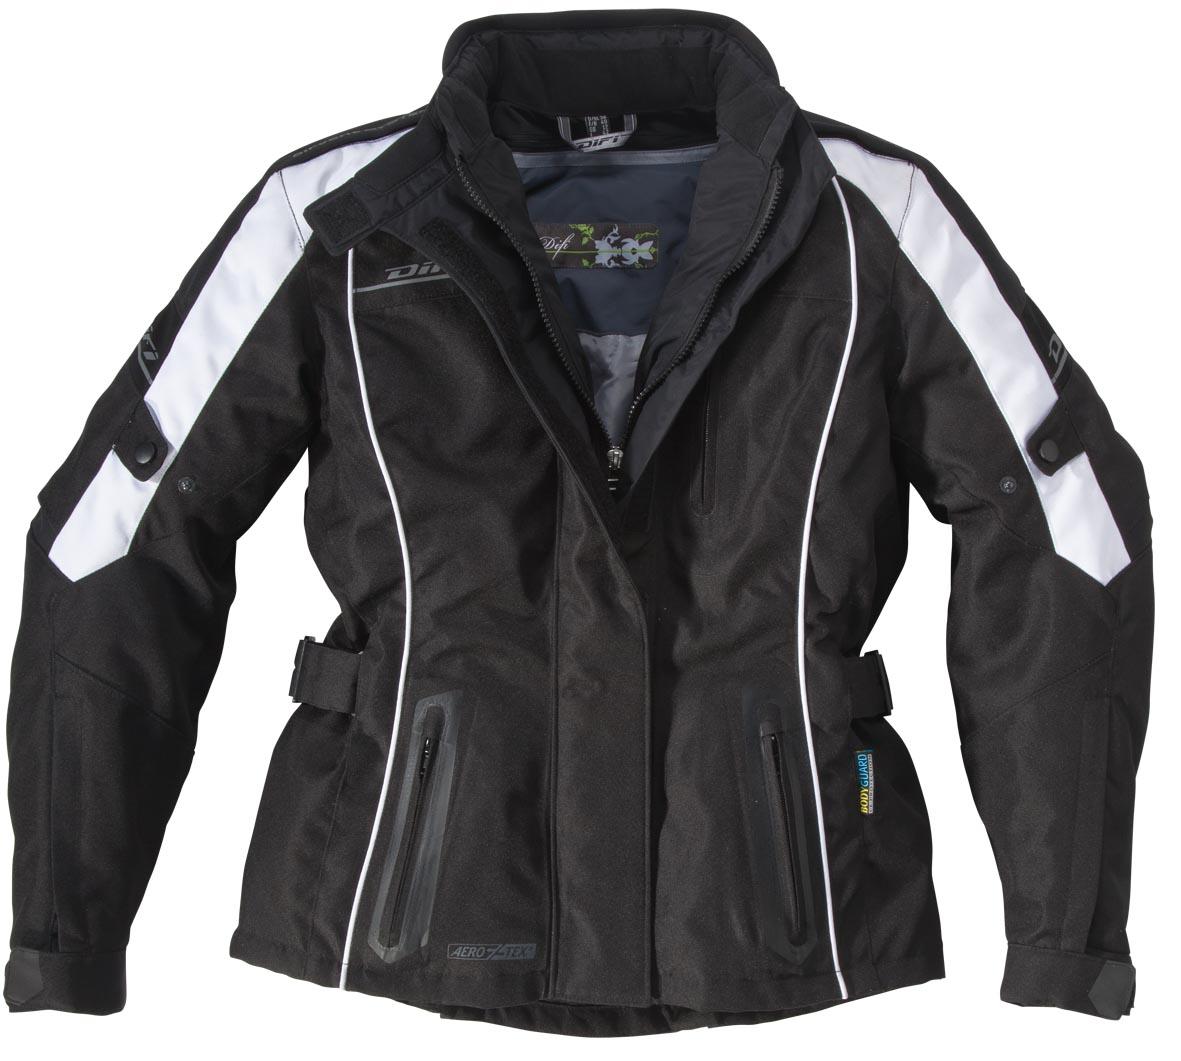 Veste Moto Femme Xenia Aerotex Noir et Blanc DIFI